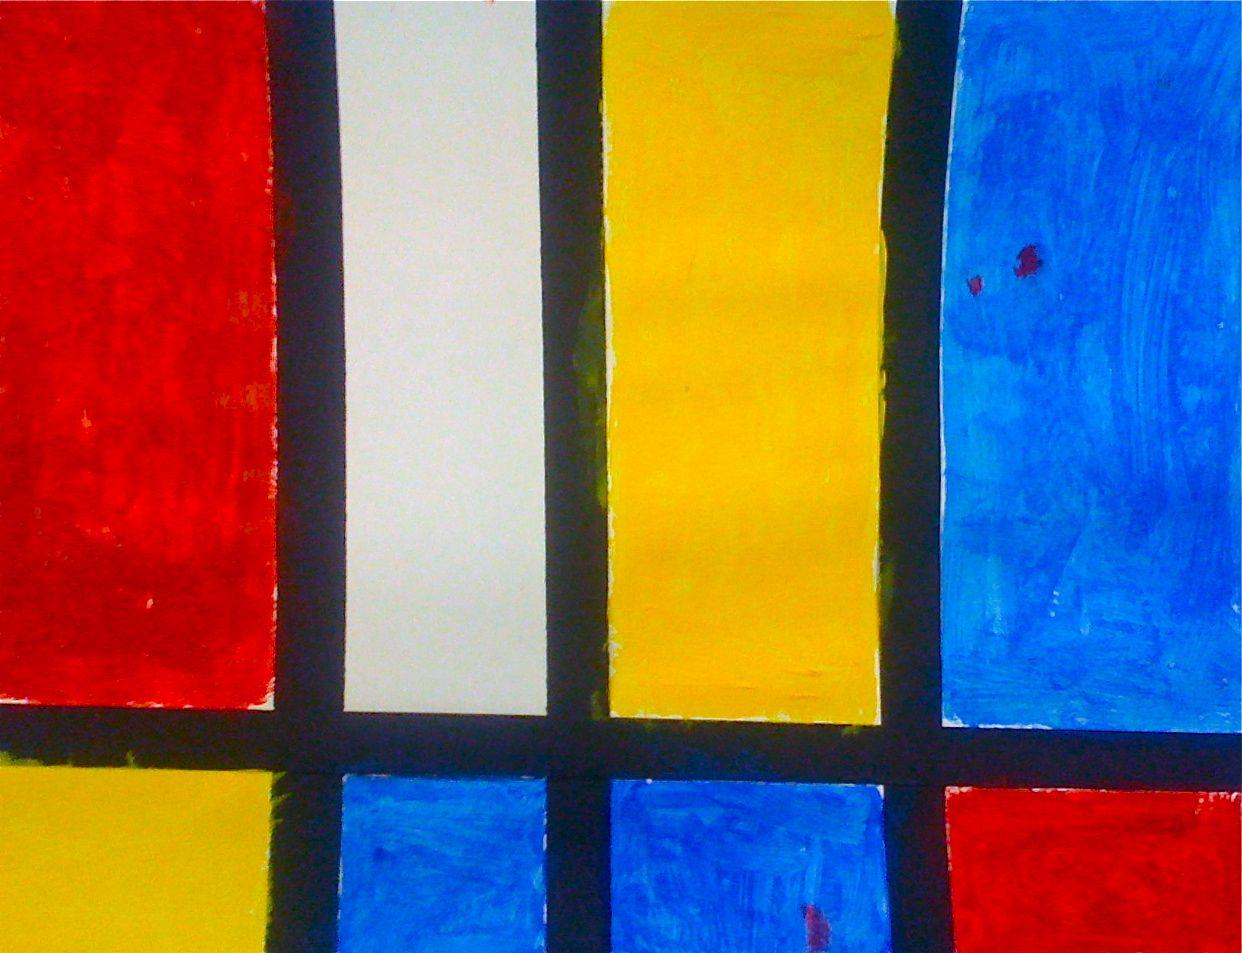 Primary Colors With Mondrain